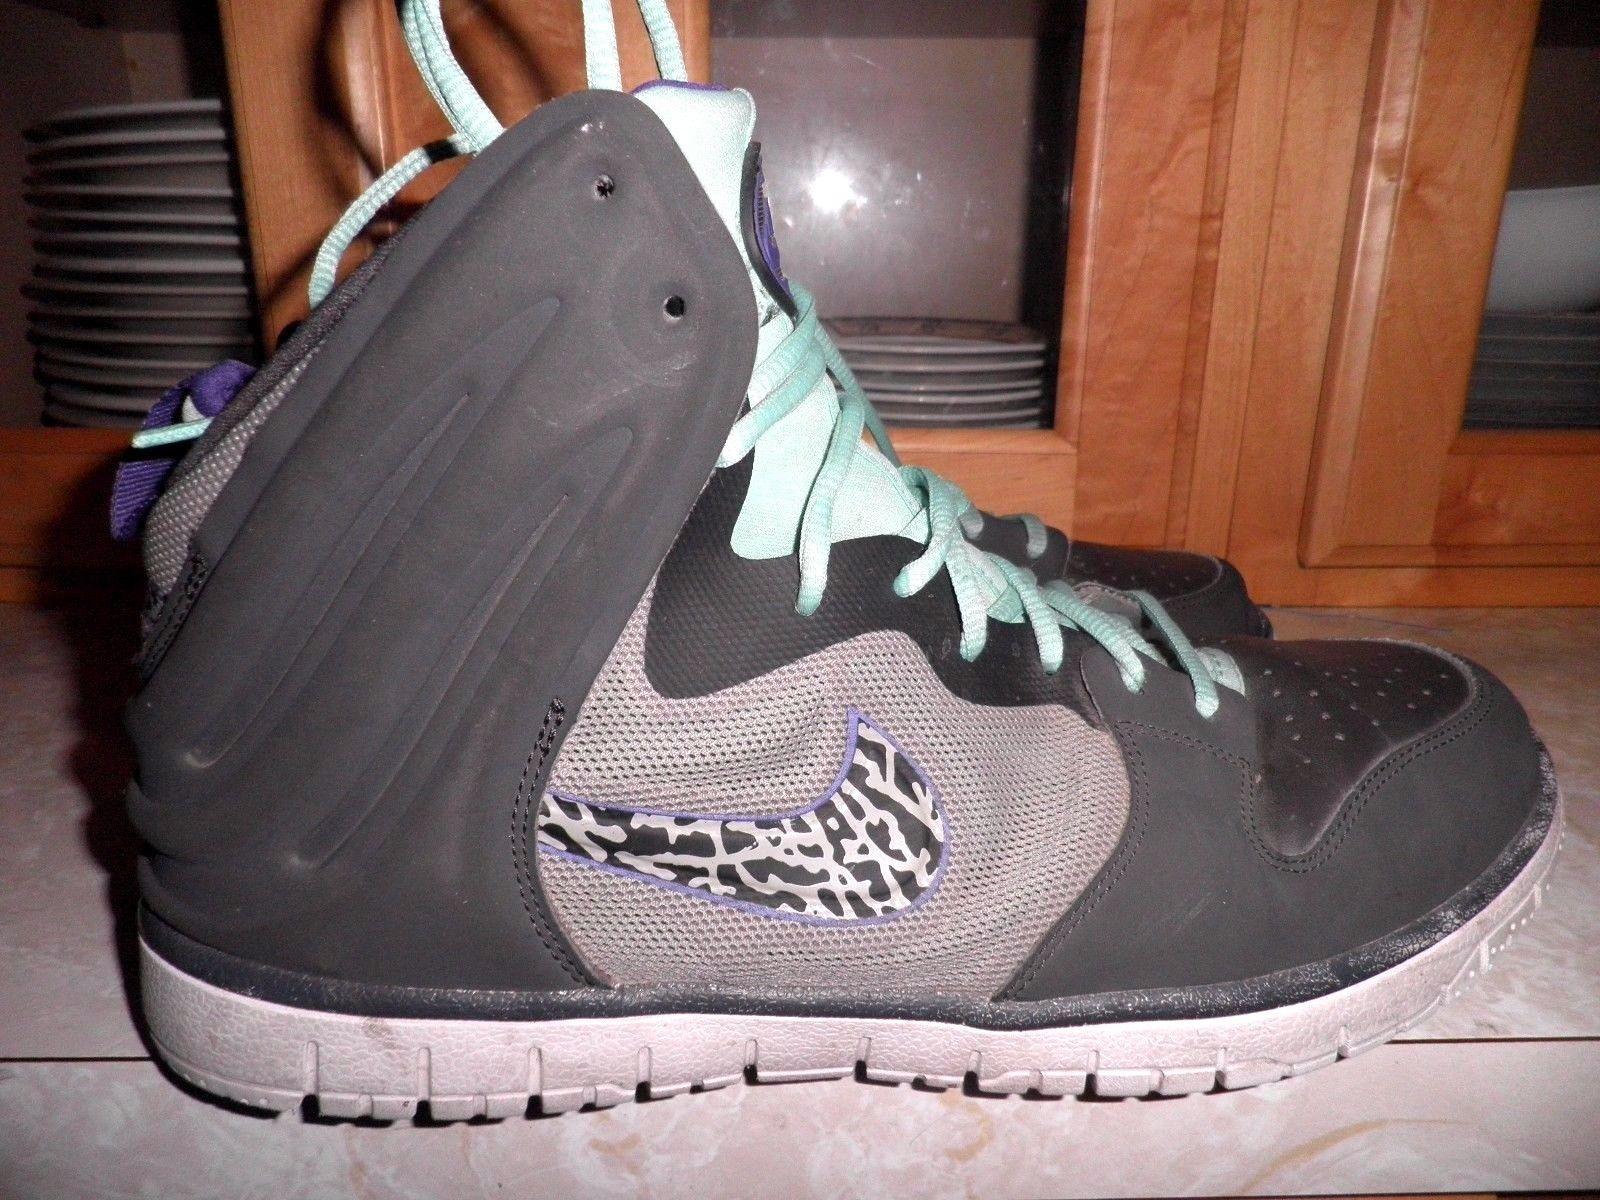 2013 Nike Dunk Free Dark Charcoal Black-Gamma Blue-White 599466-005 Size  11.5  e98b9aff79